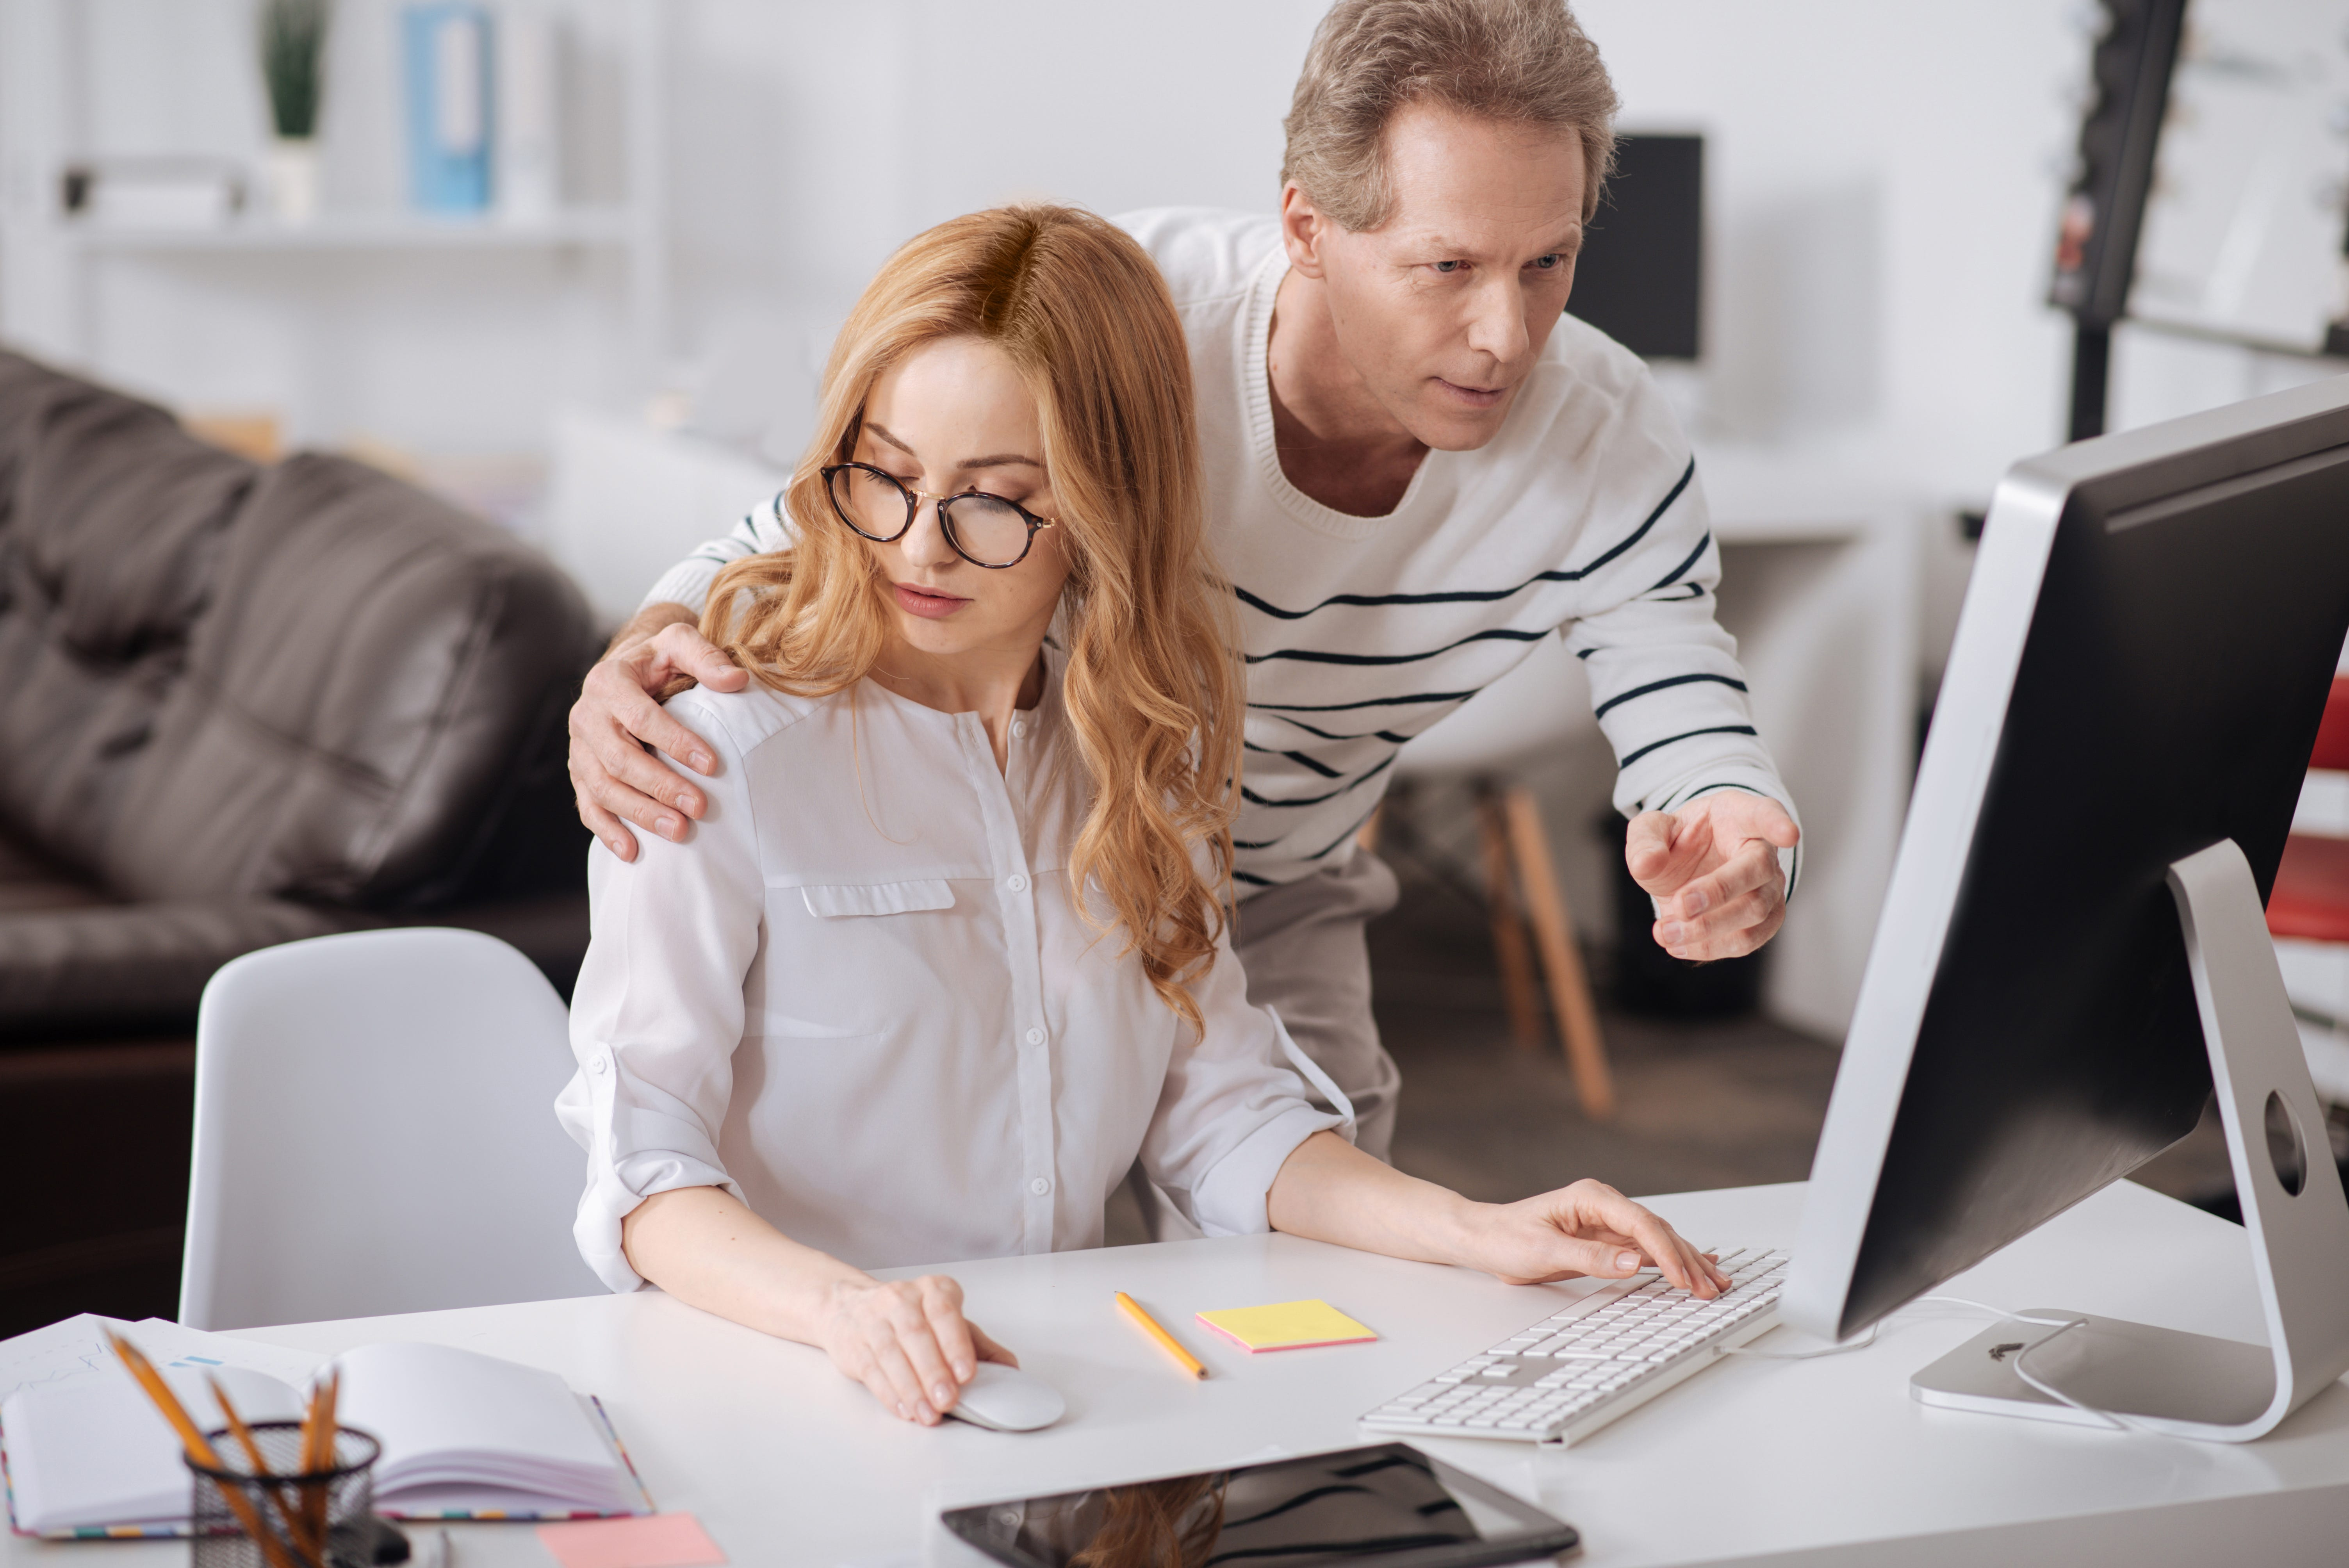 Sexually harass spouse